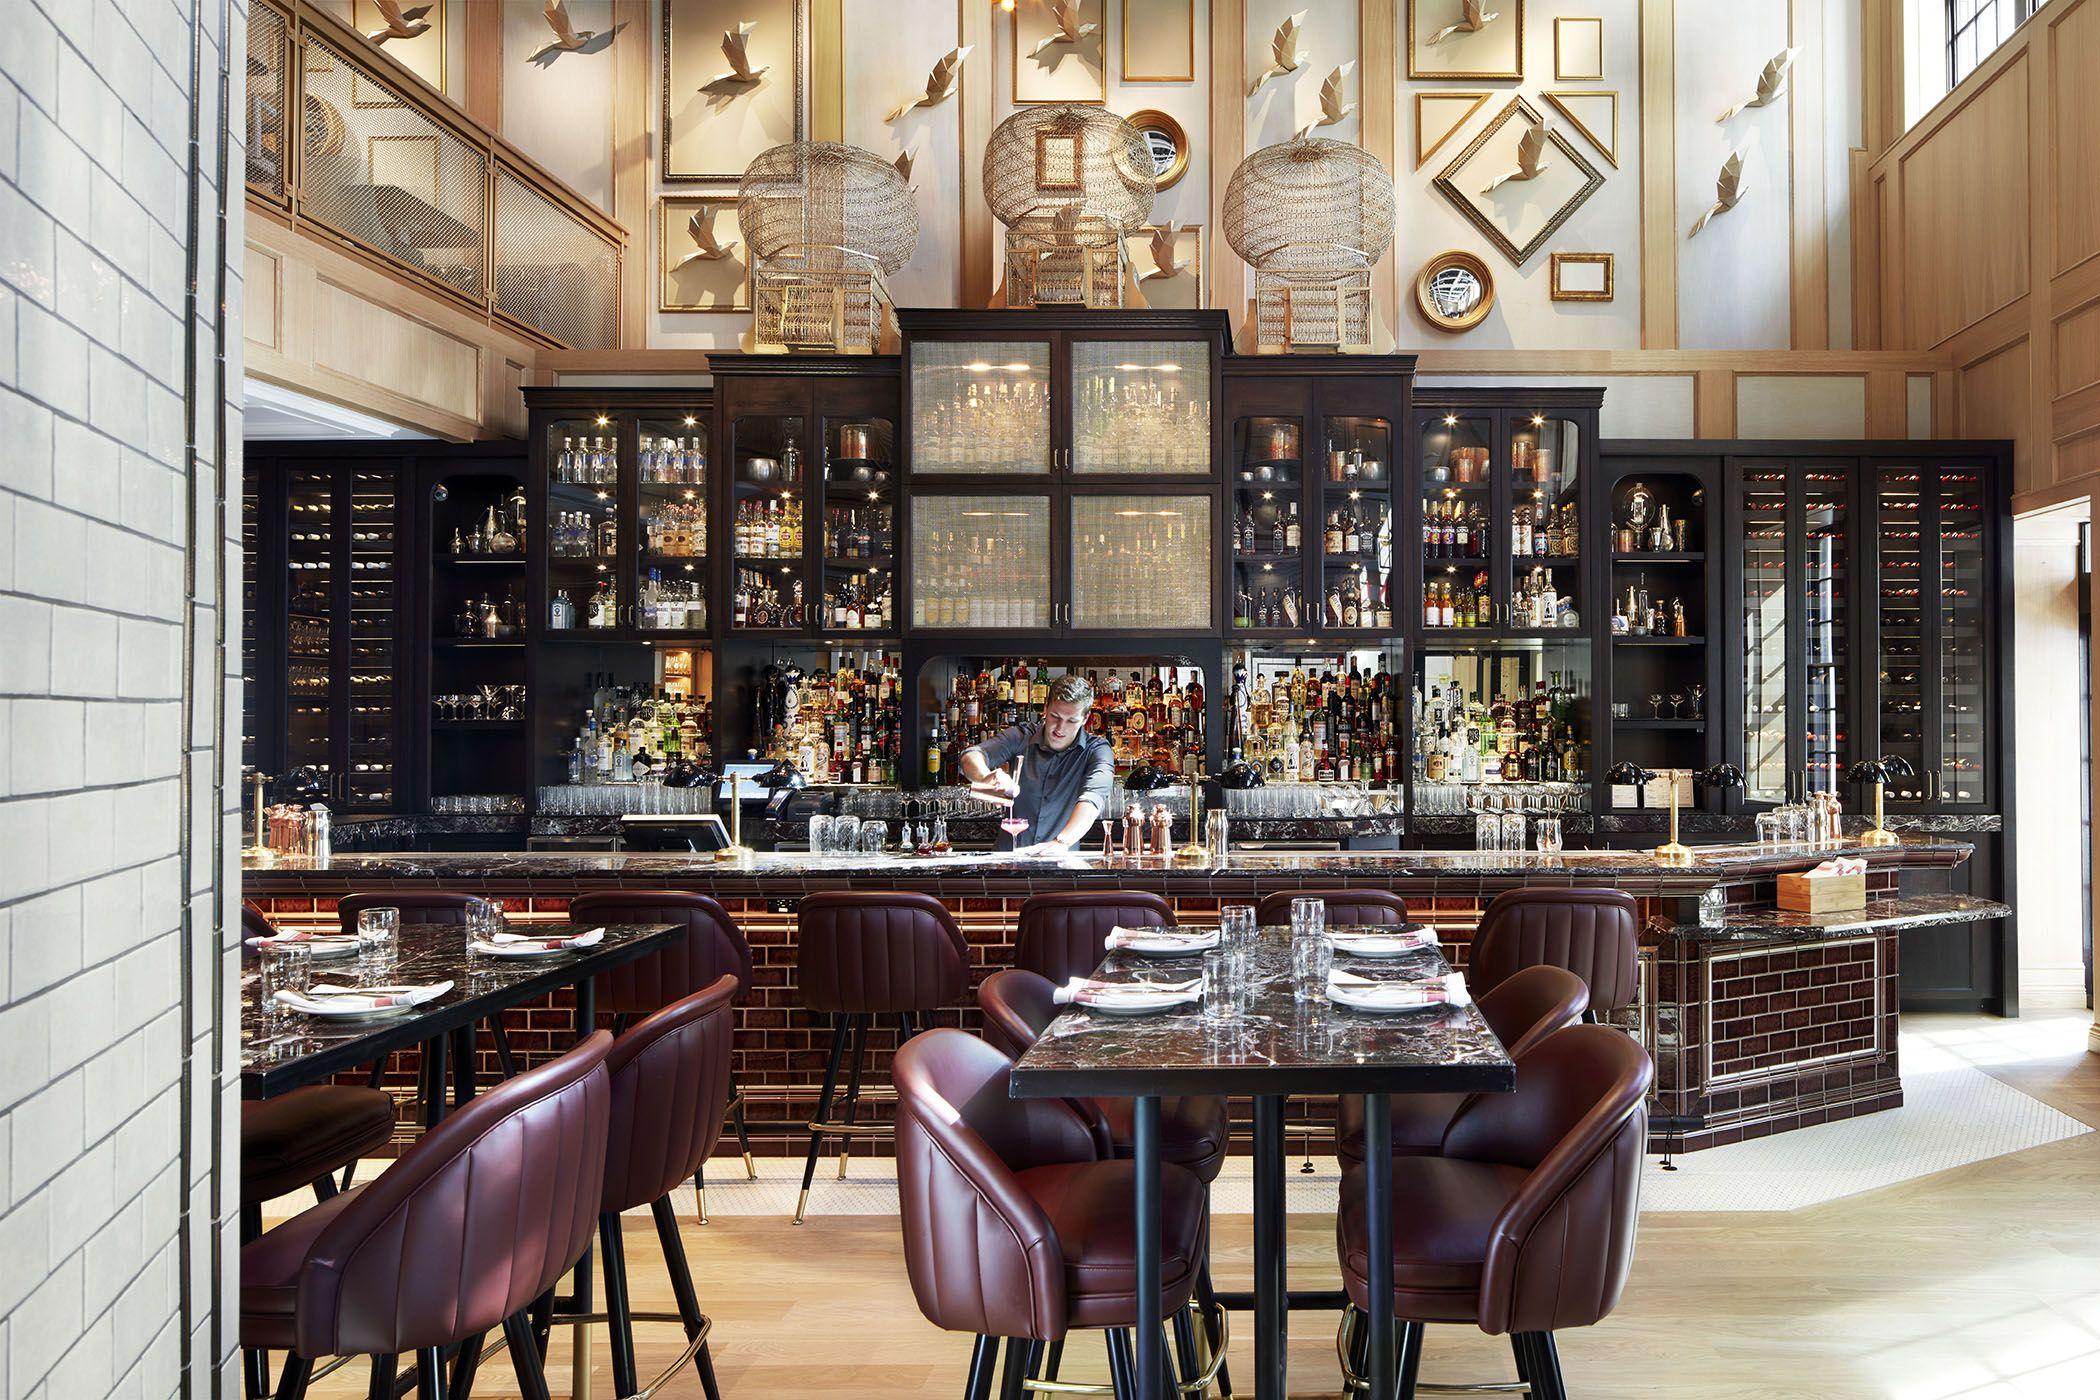 Restaurant Design Vancouver : Nightingale by david hawksworth studio munge bar